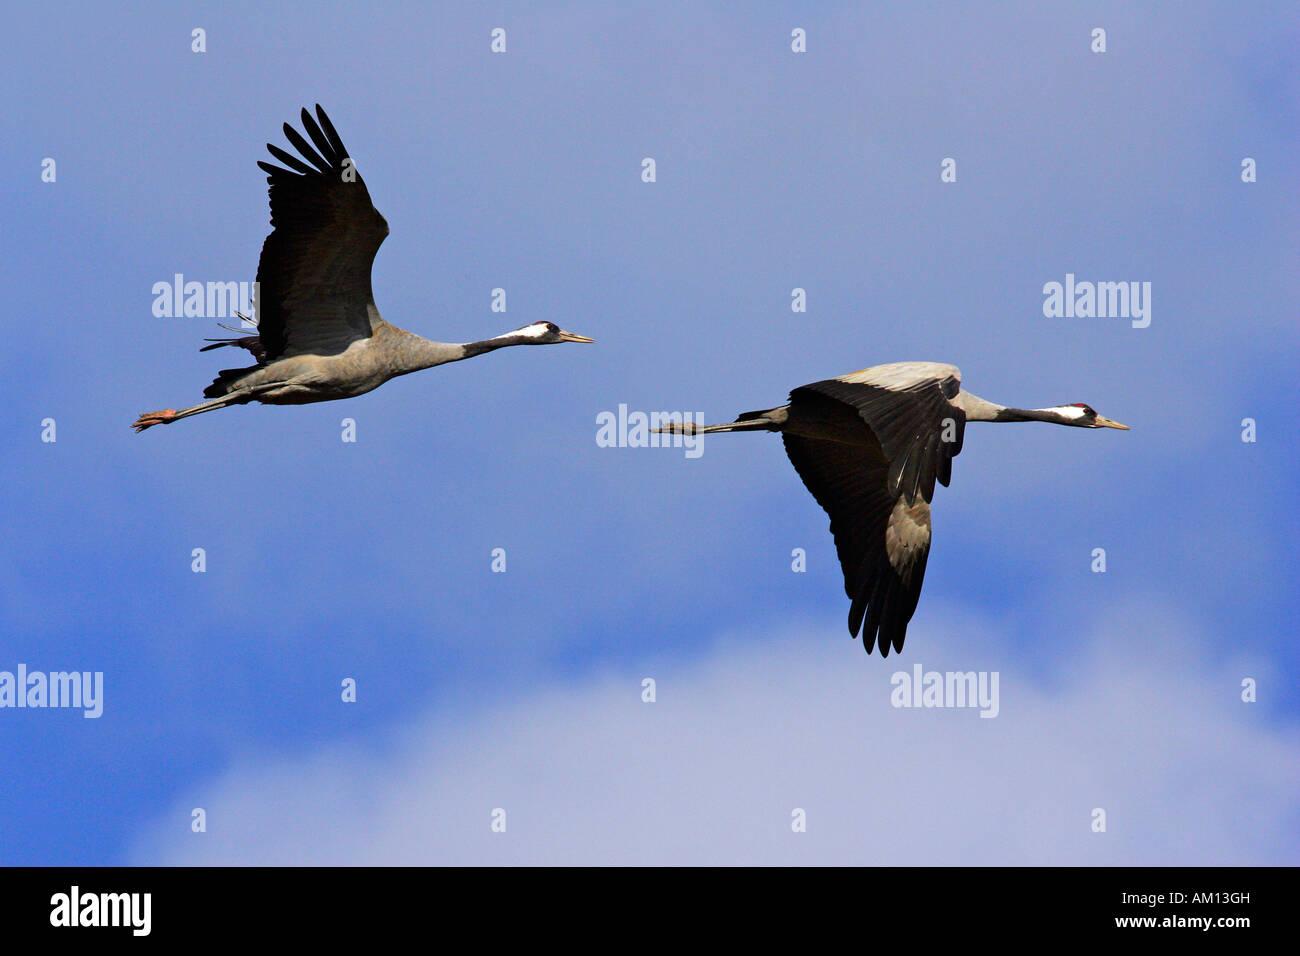 Couple of flying common cranes (Grus grus) - national park Vorpommersche Boddenlandschaft, Mecklenburg-Western Pomerania, Stock Photo